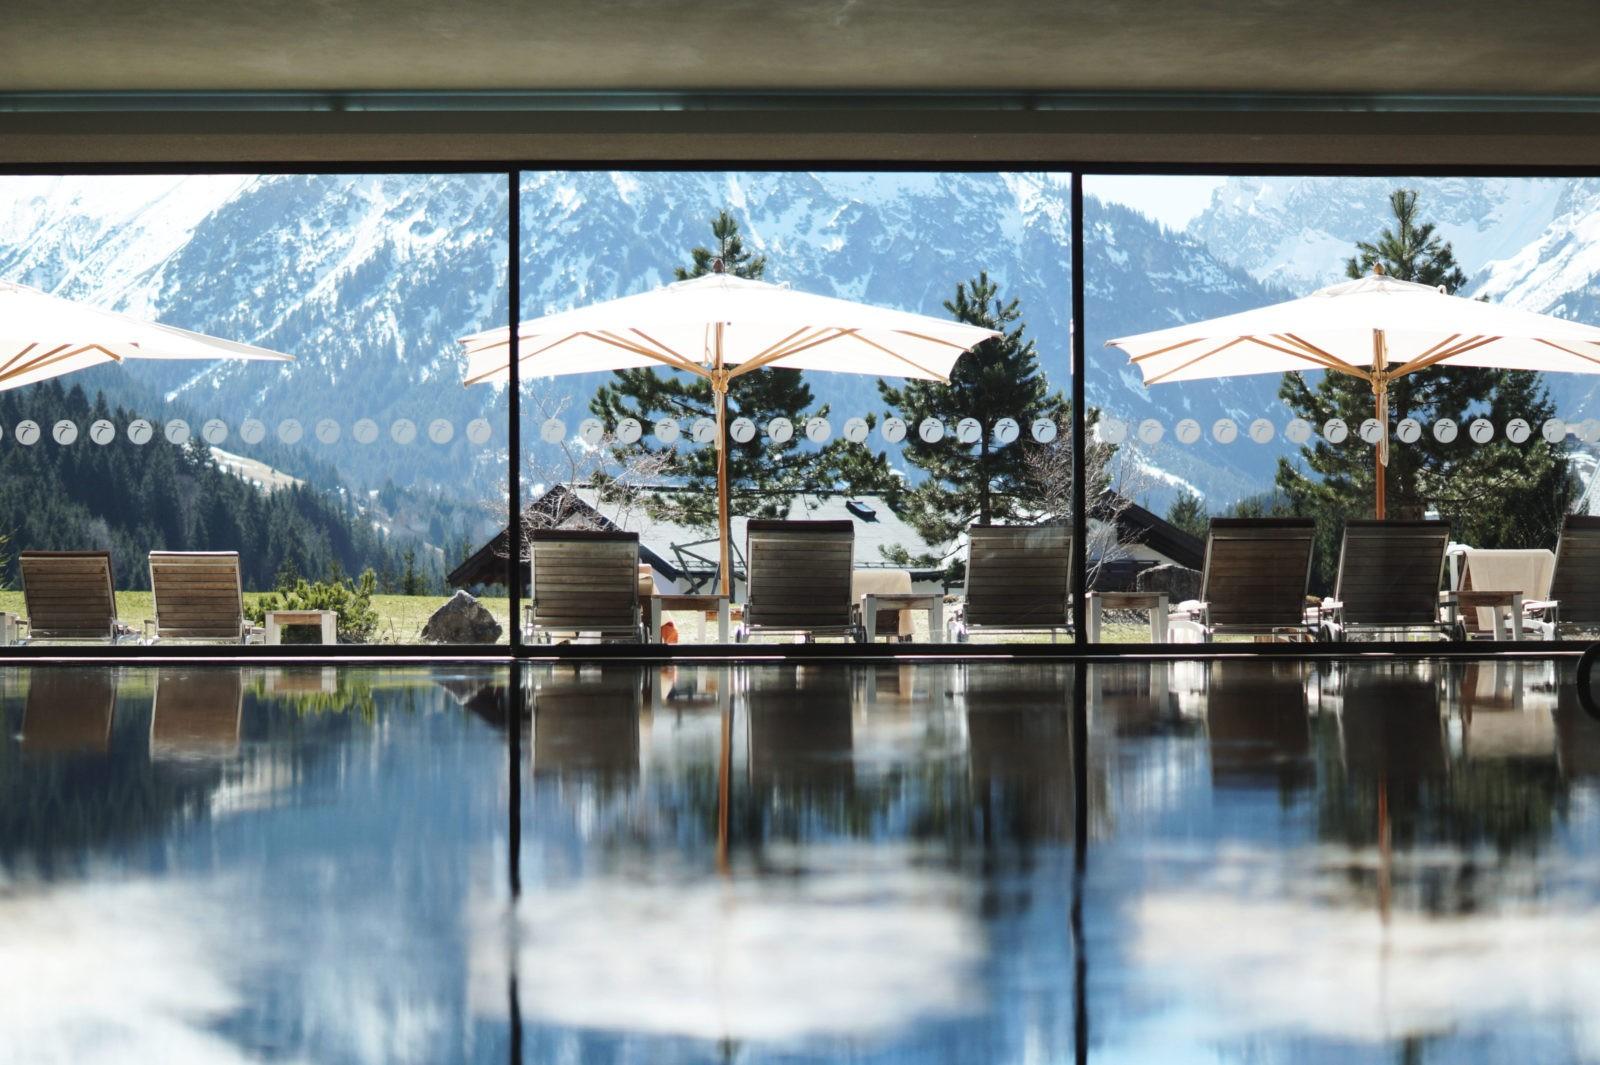 Hotel Review Travel Charme Ifen Hotel Kleinwalsertal Austria Österreich Hotelbewertung Puria Premium Spa Pool Panorama